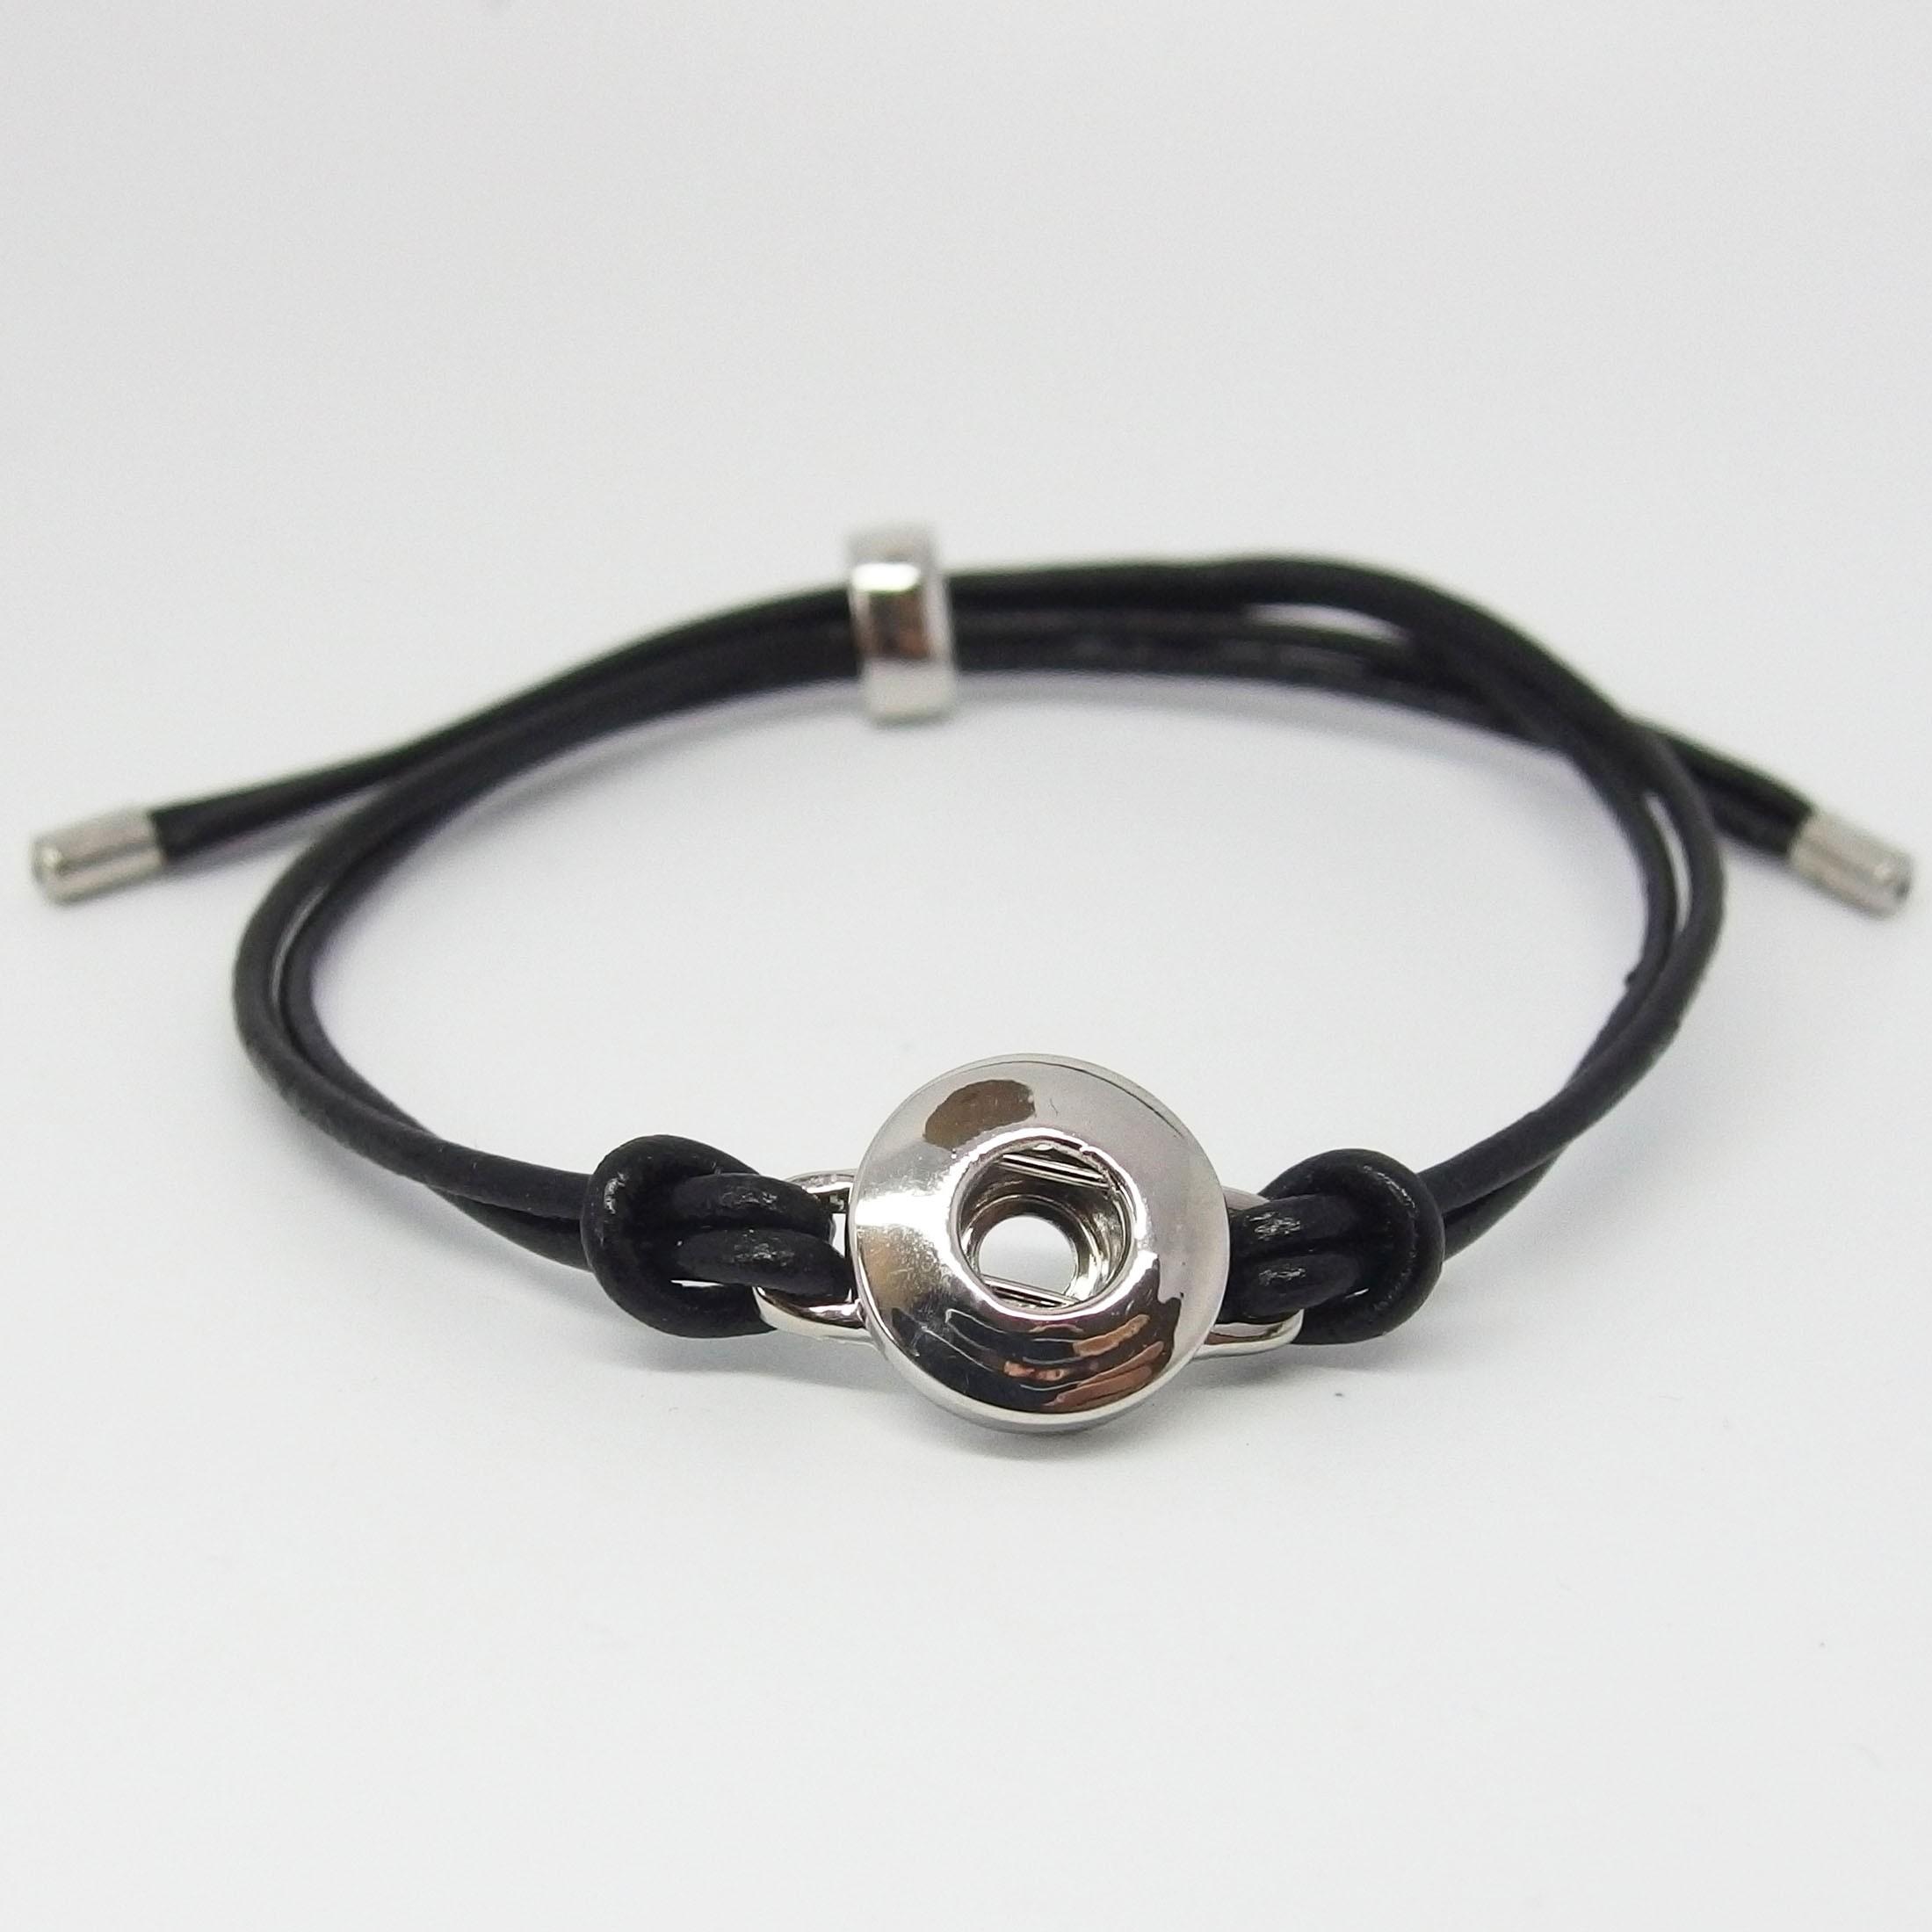 CHMA001 - Armbänder echt Leder verstellbar für 1 MINI Schmuckdruckknopf